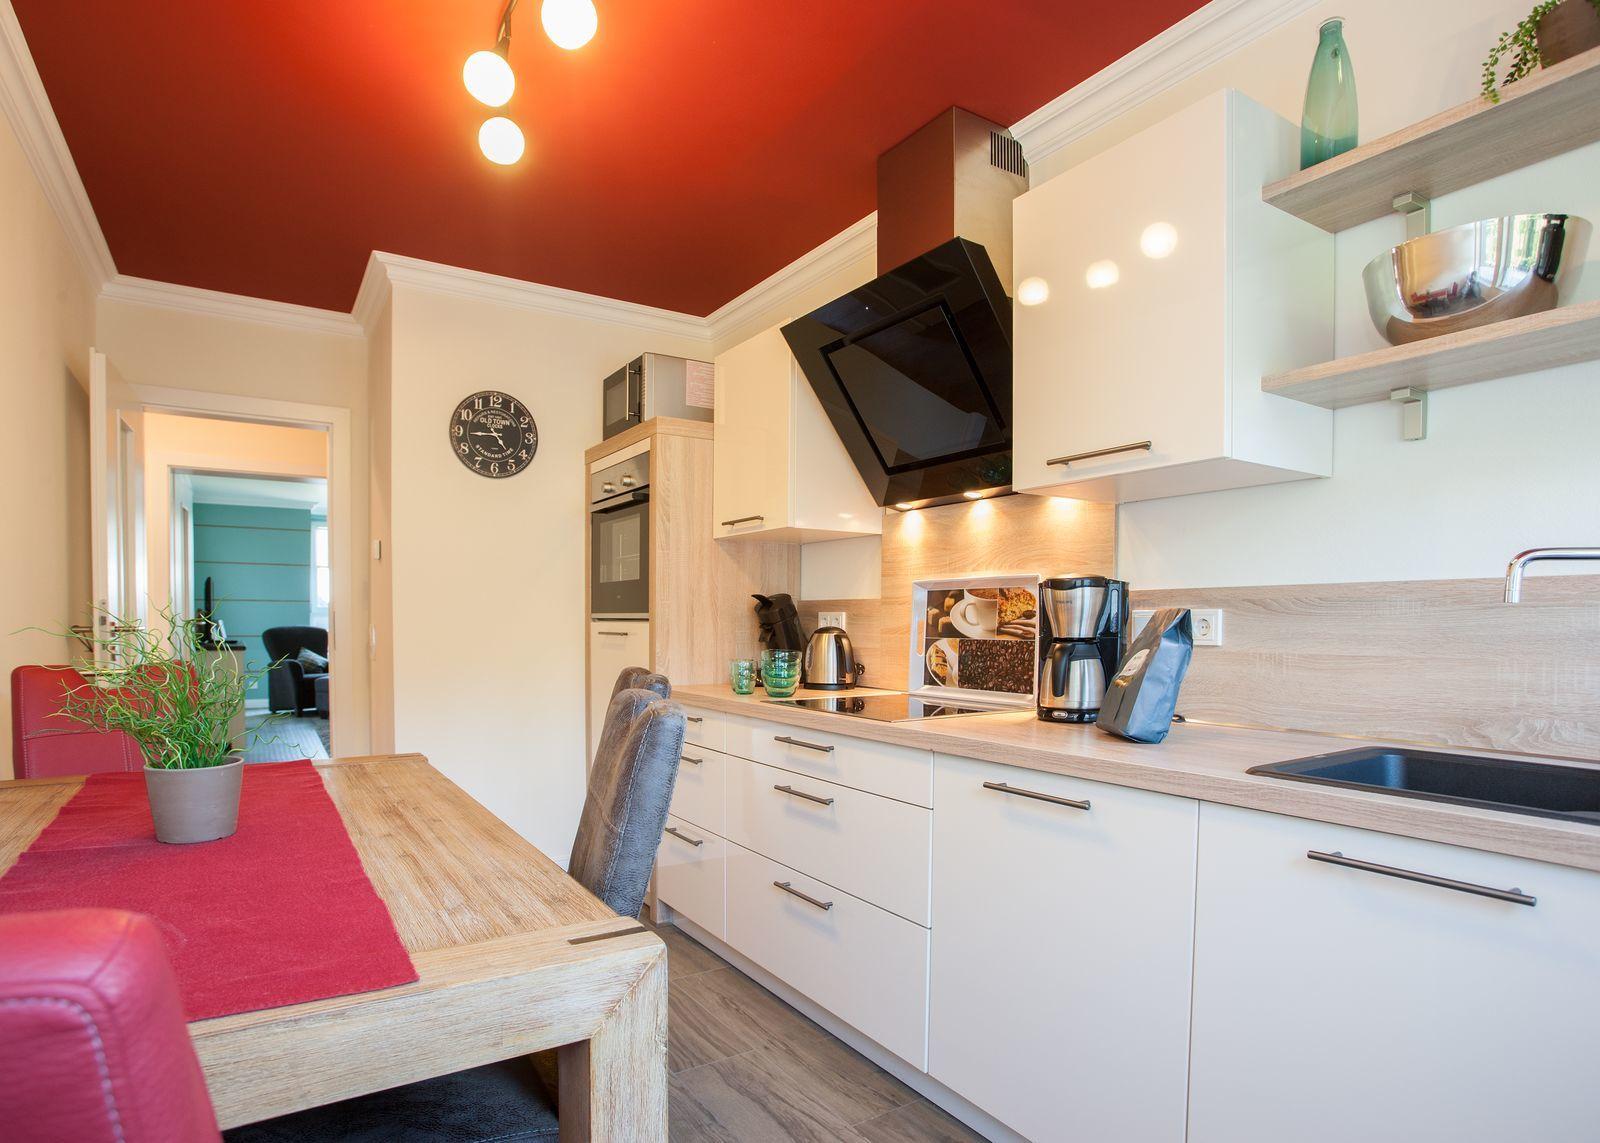 Appartement - Fichtenweg 31-K Villa Winterberg ****